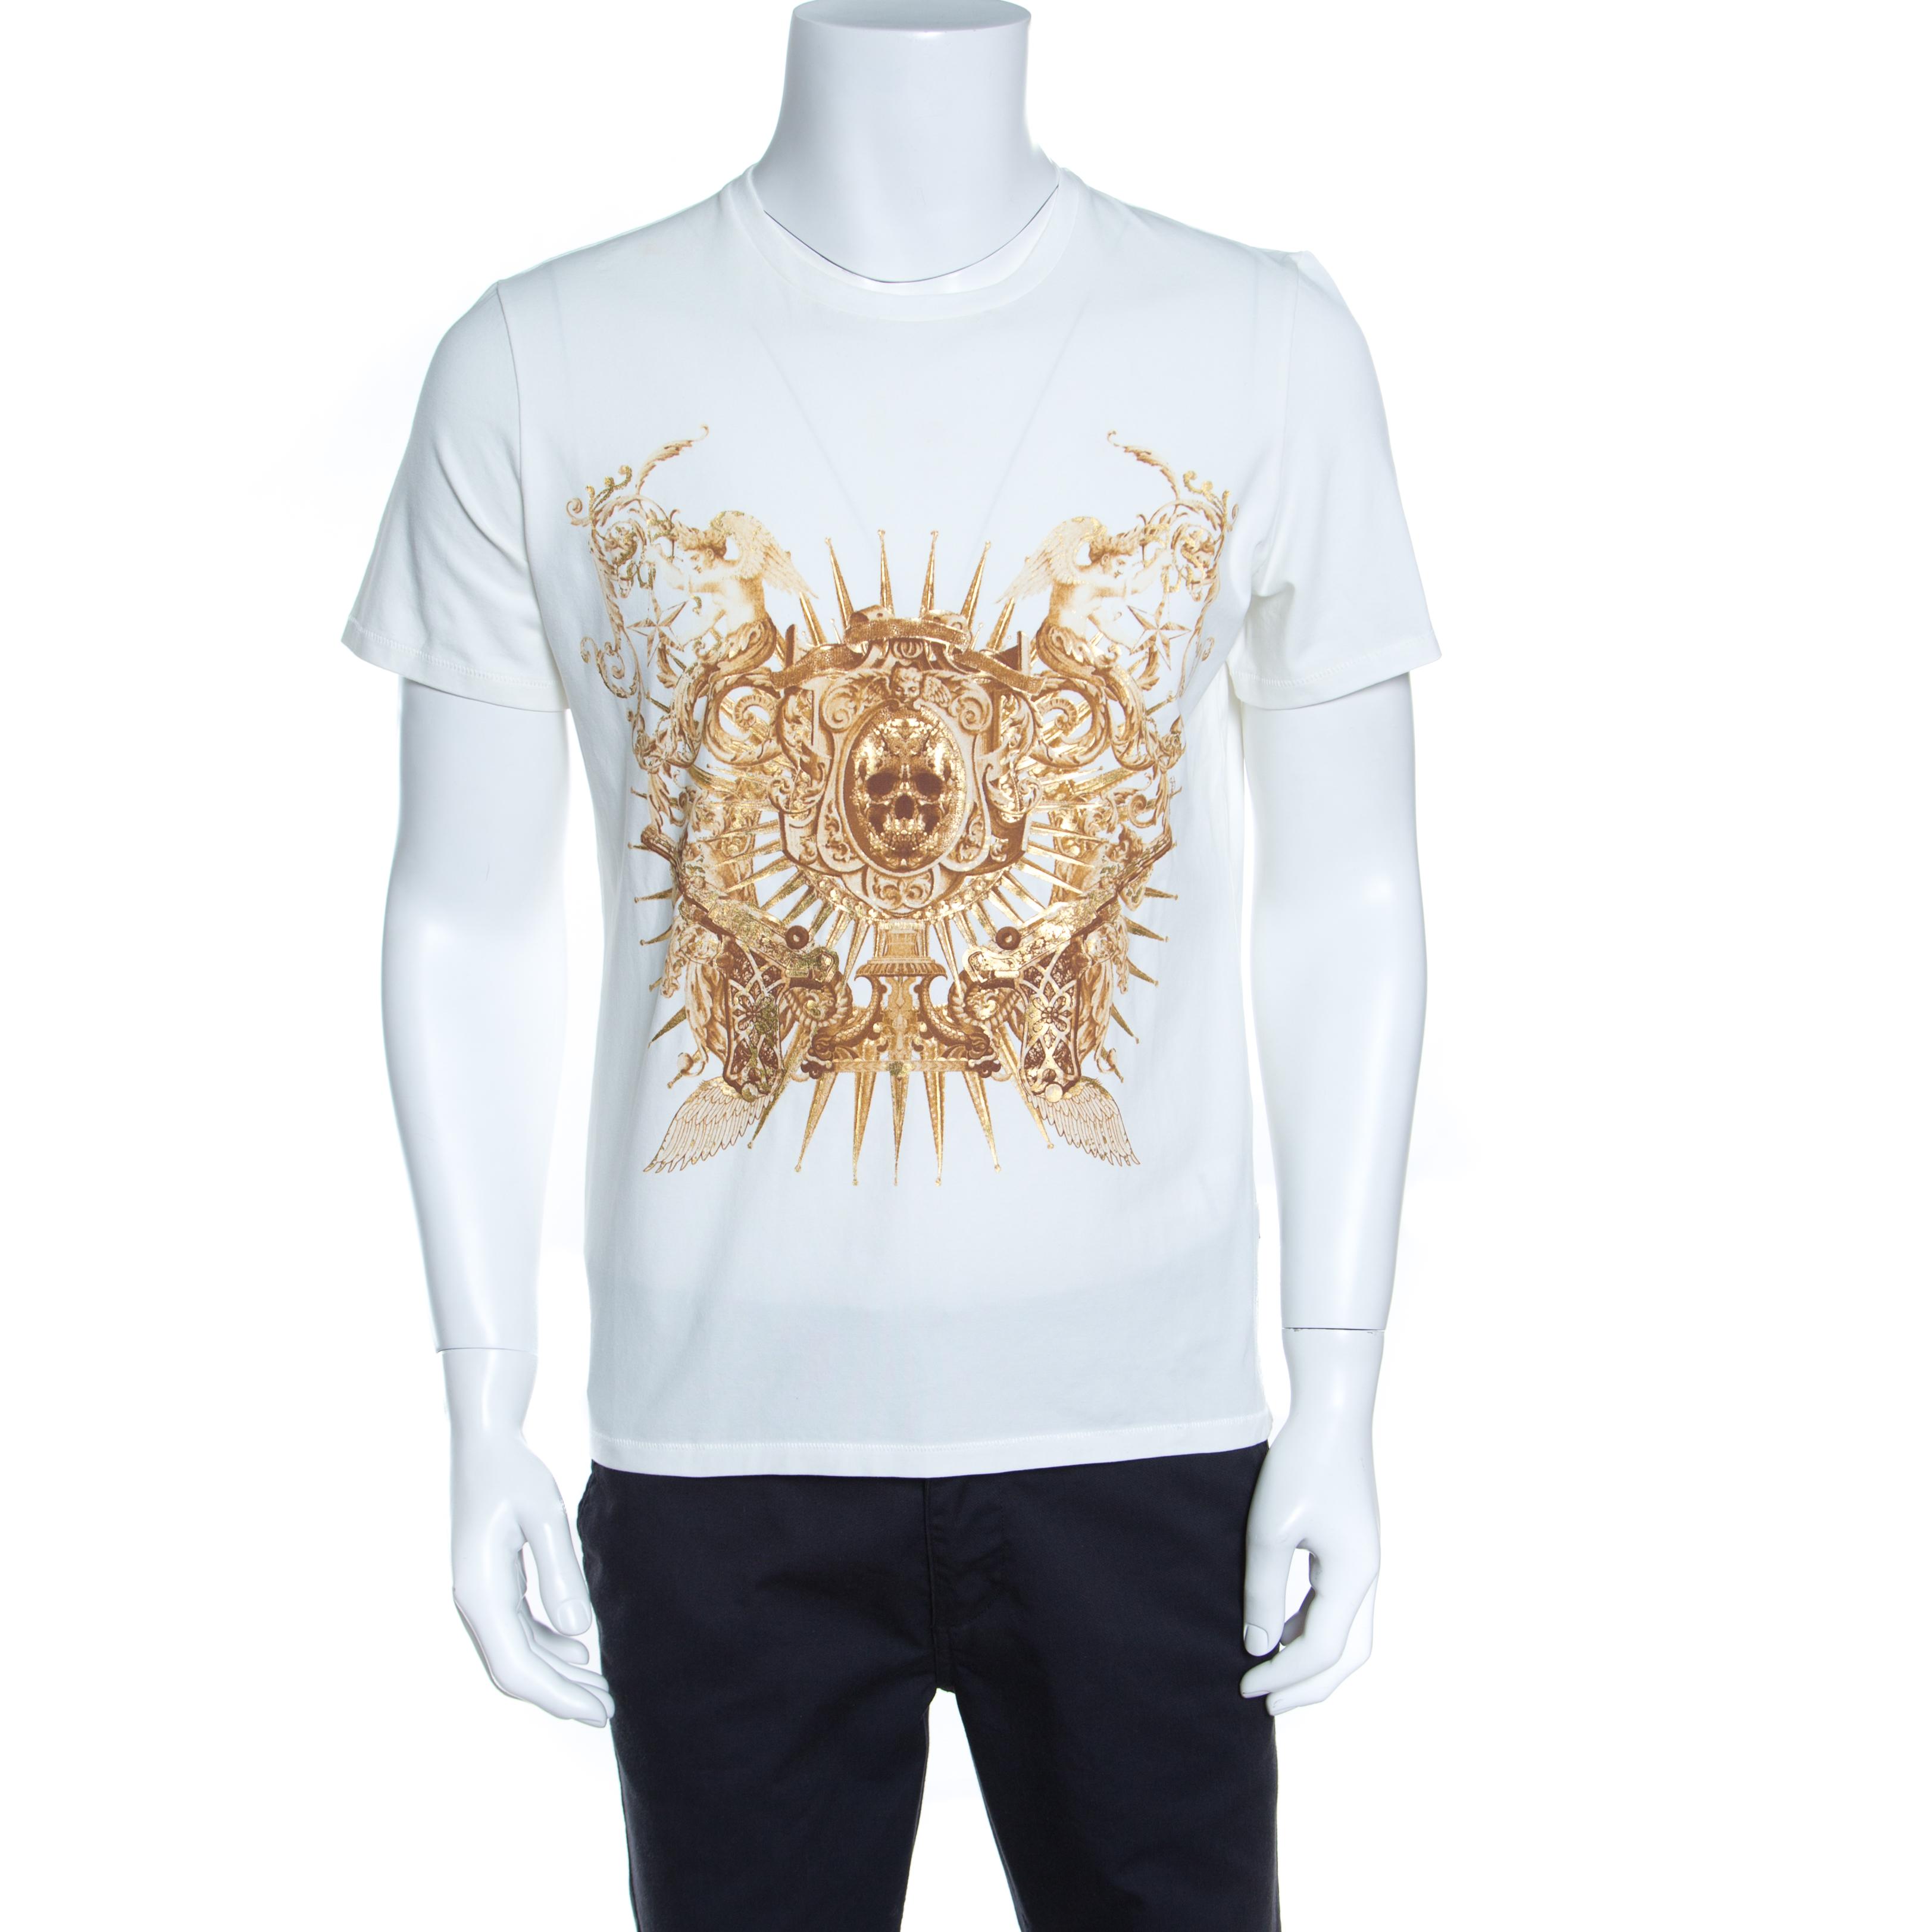 9db04fb8e559a ... Just Cavalli White Metallic Skull Print Short Sleeve T-Shirt XL.  nextprev. prevnext